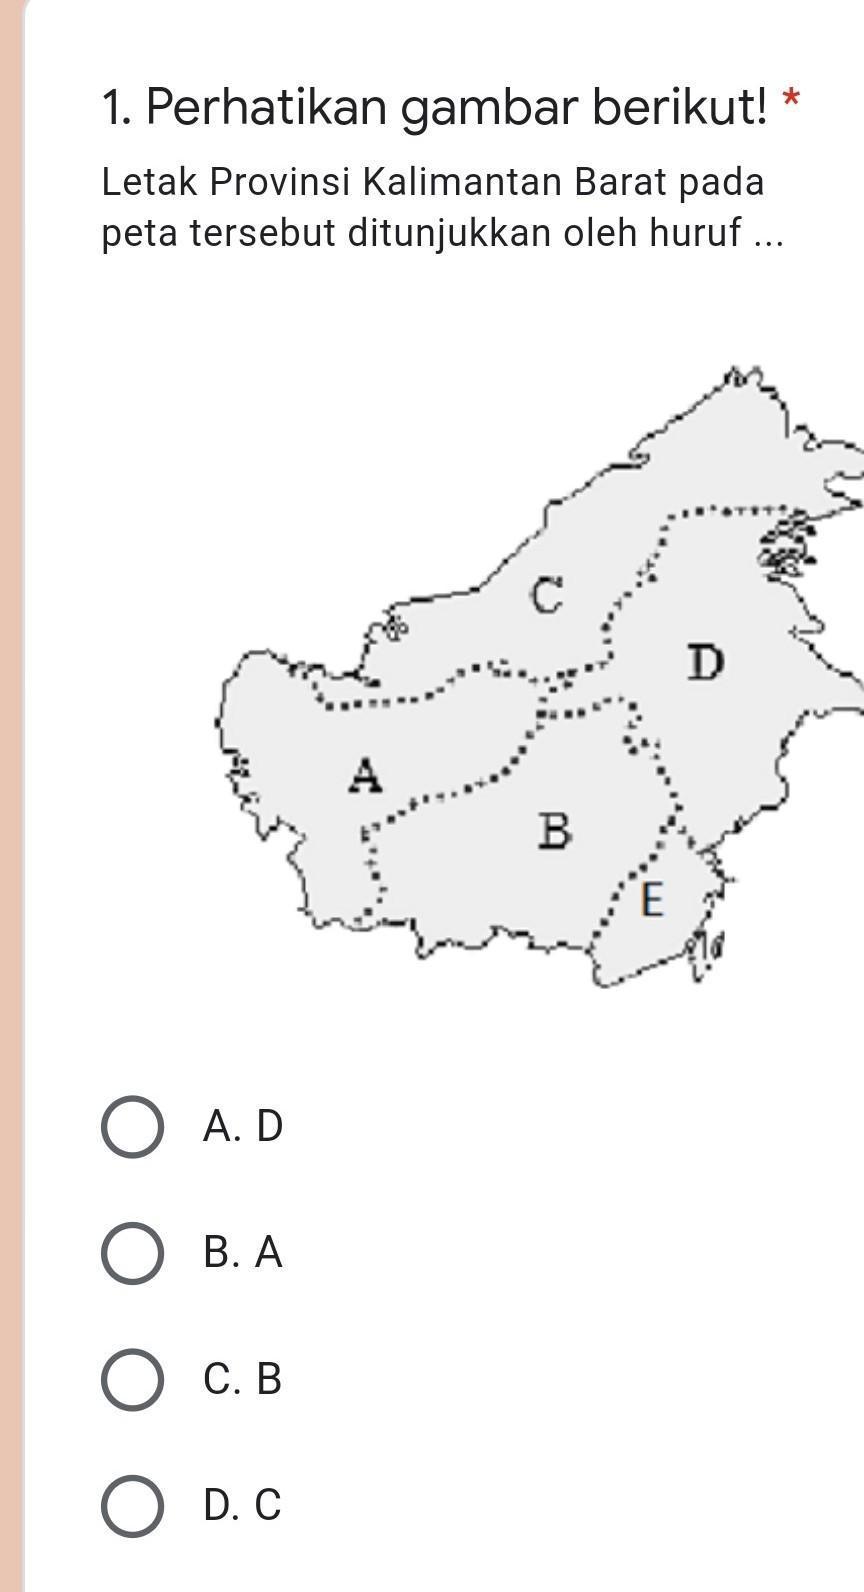 Peta Kalimantan Hitam Putih : kalimantan, hitam, putih, Letak, Provinsi, Kalimantan, Barat, Tersebut, Tunjukkan, Huruf...tolong, Jawab, Brainly.co.id